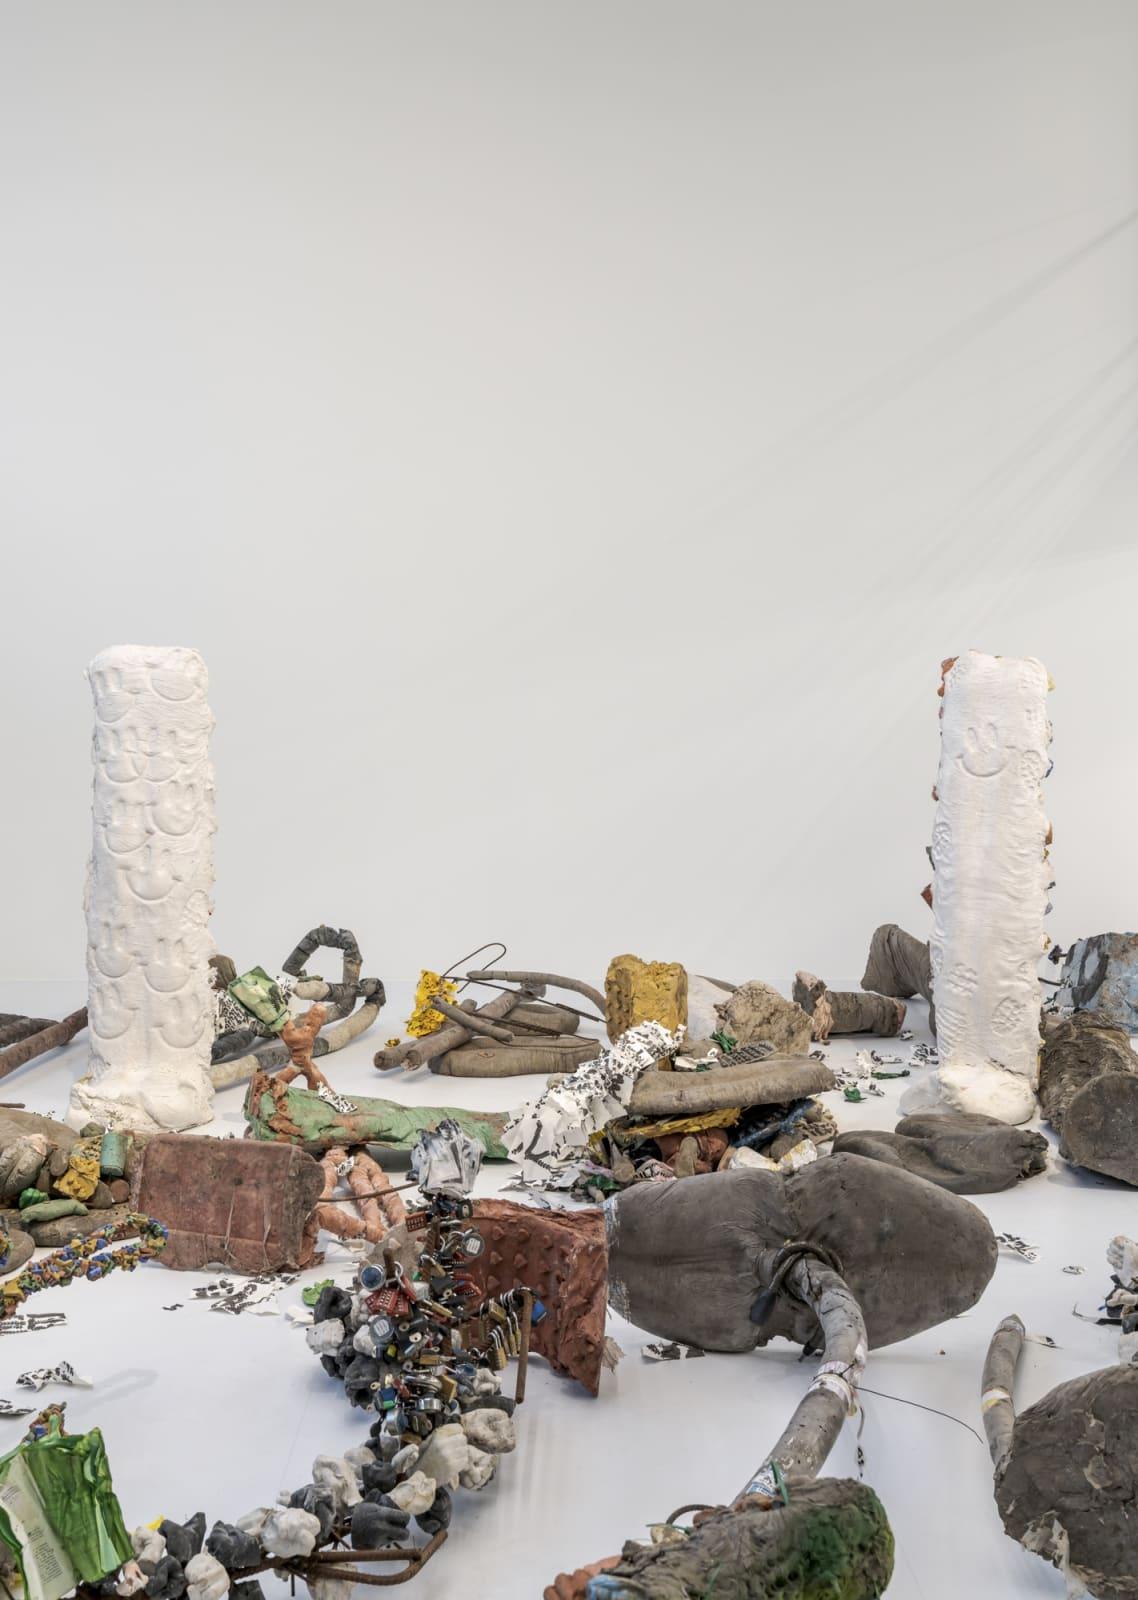 Michael Dean, Garden of Delete, 2021, Installation View, Barakat Contemporary